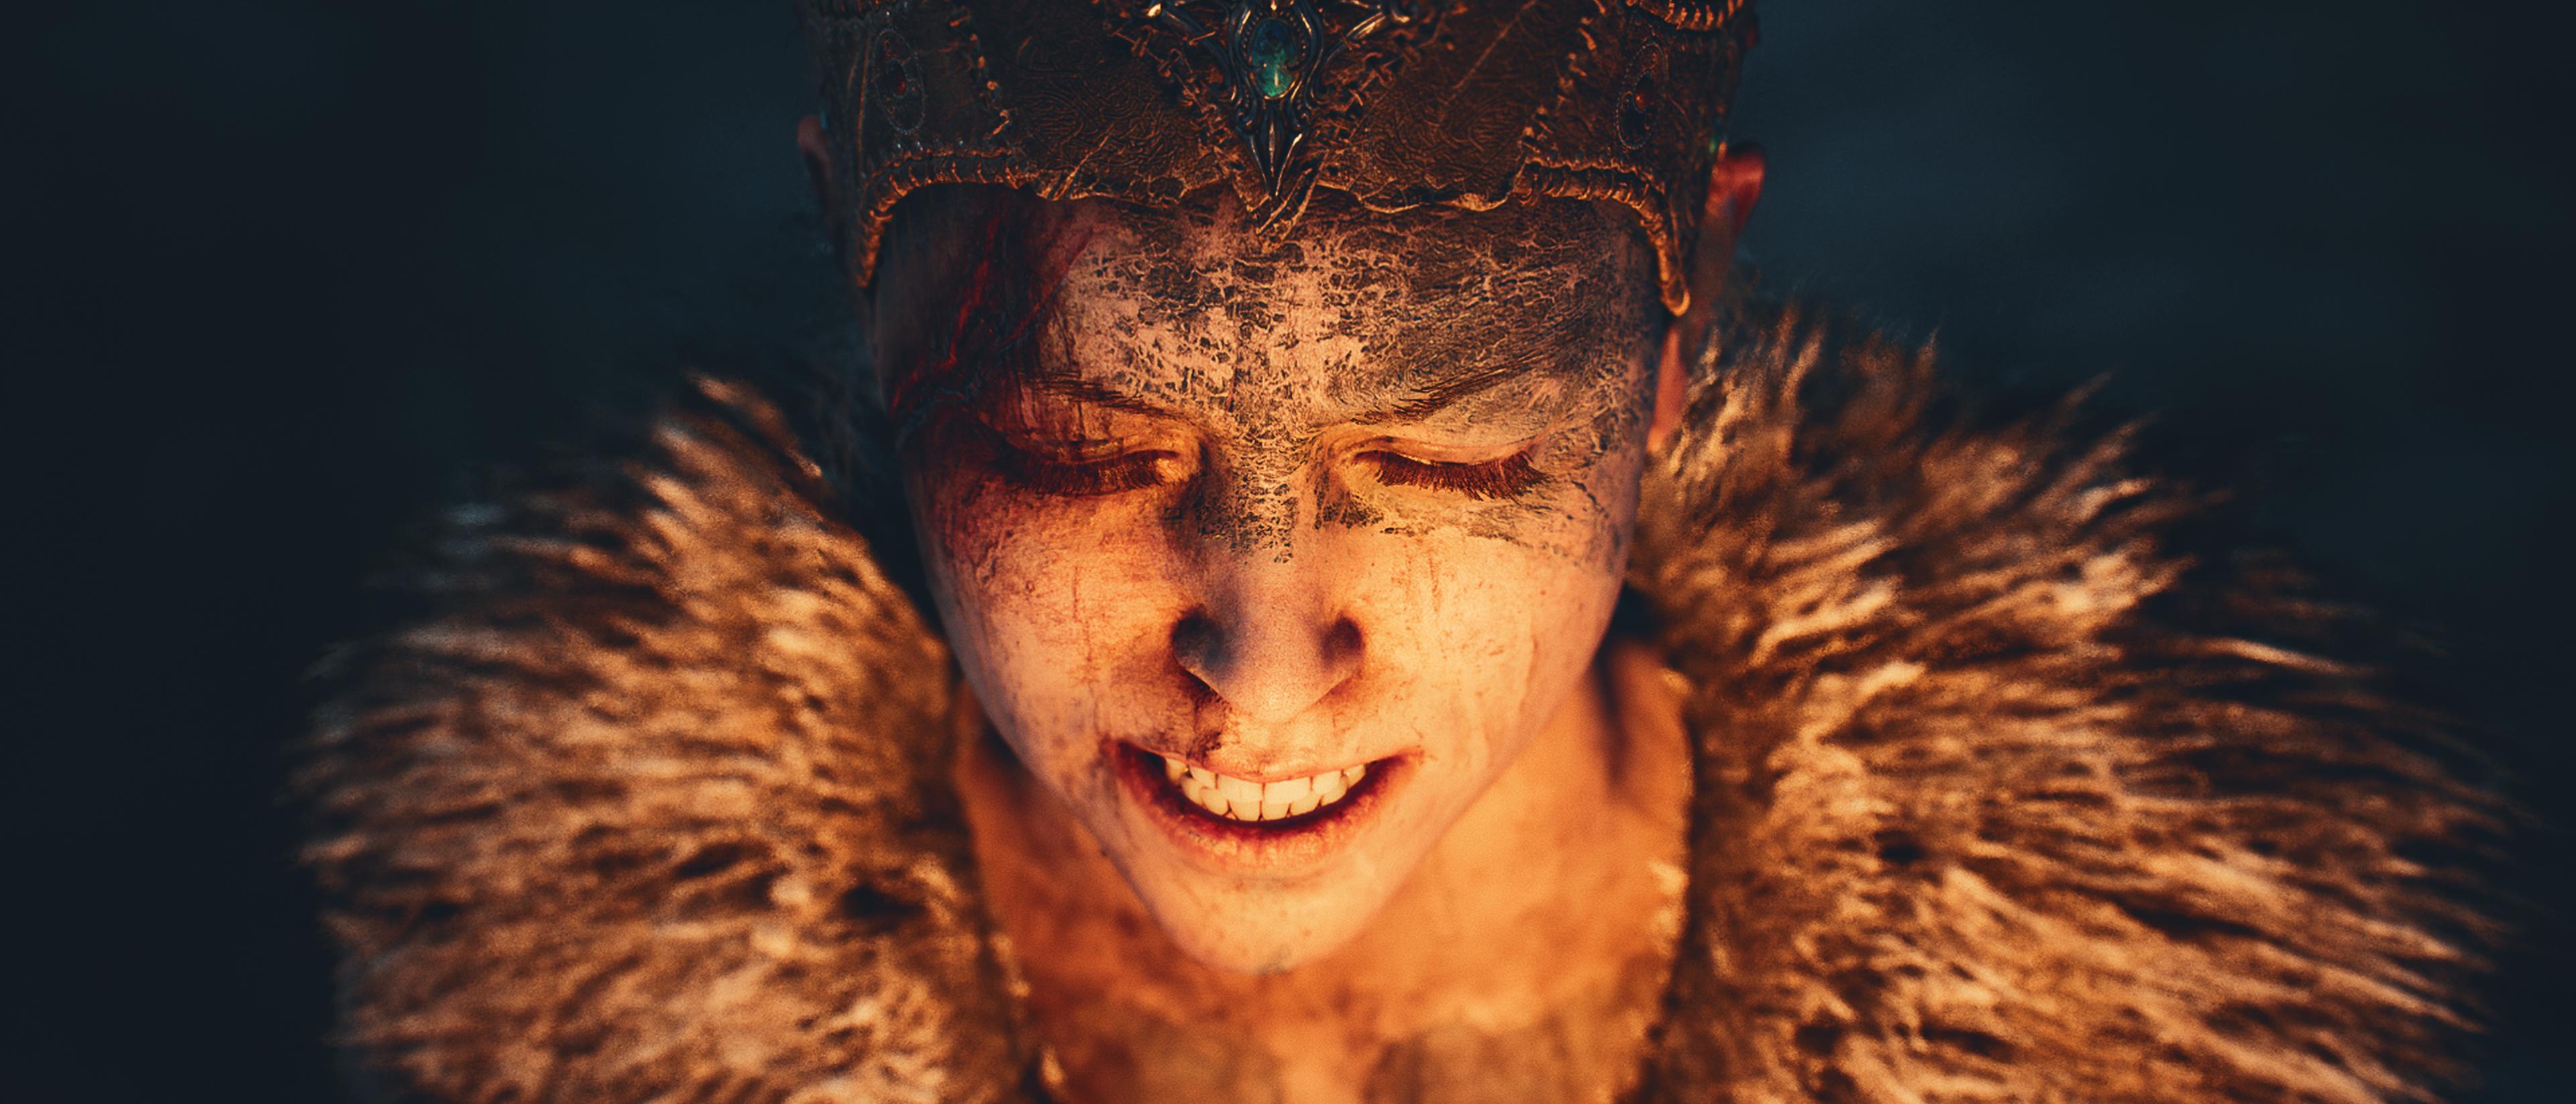 hellblade_senuas_sacrifice_0.png